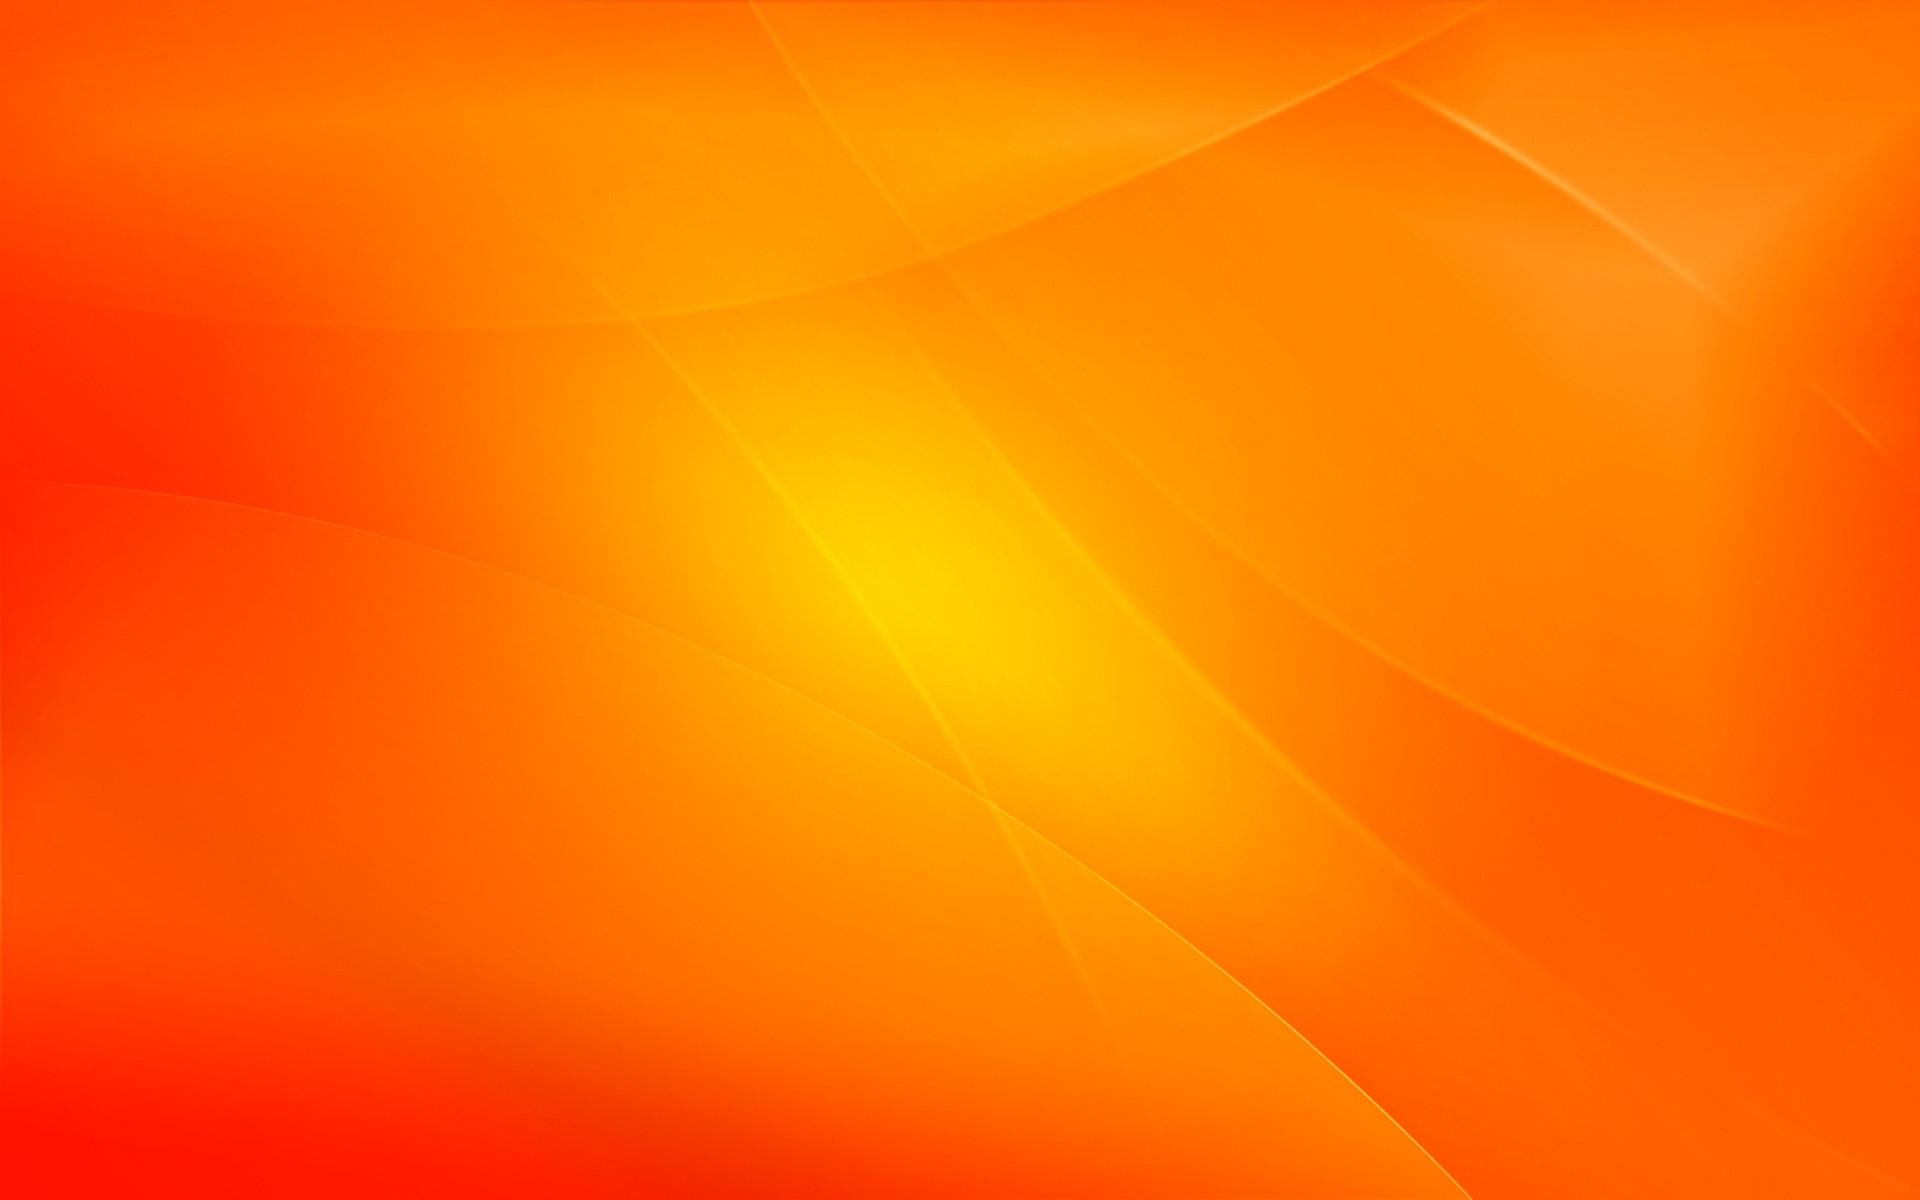 orange wallpaper06 - photo #45